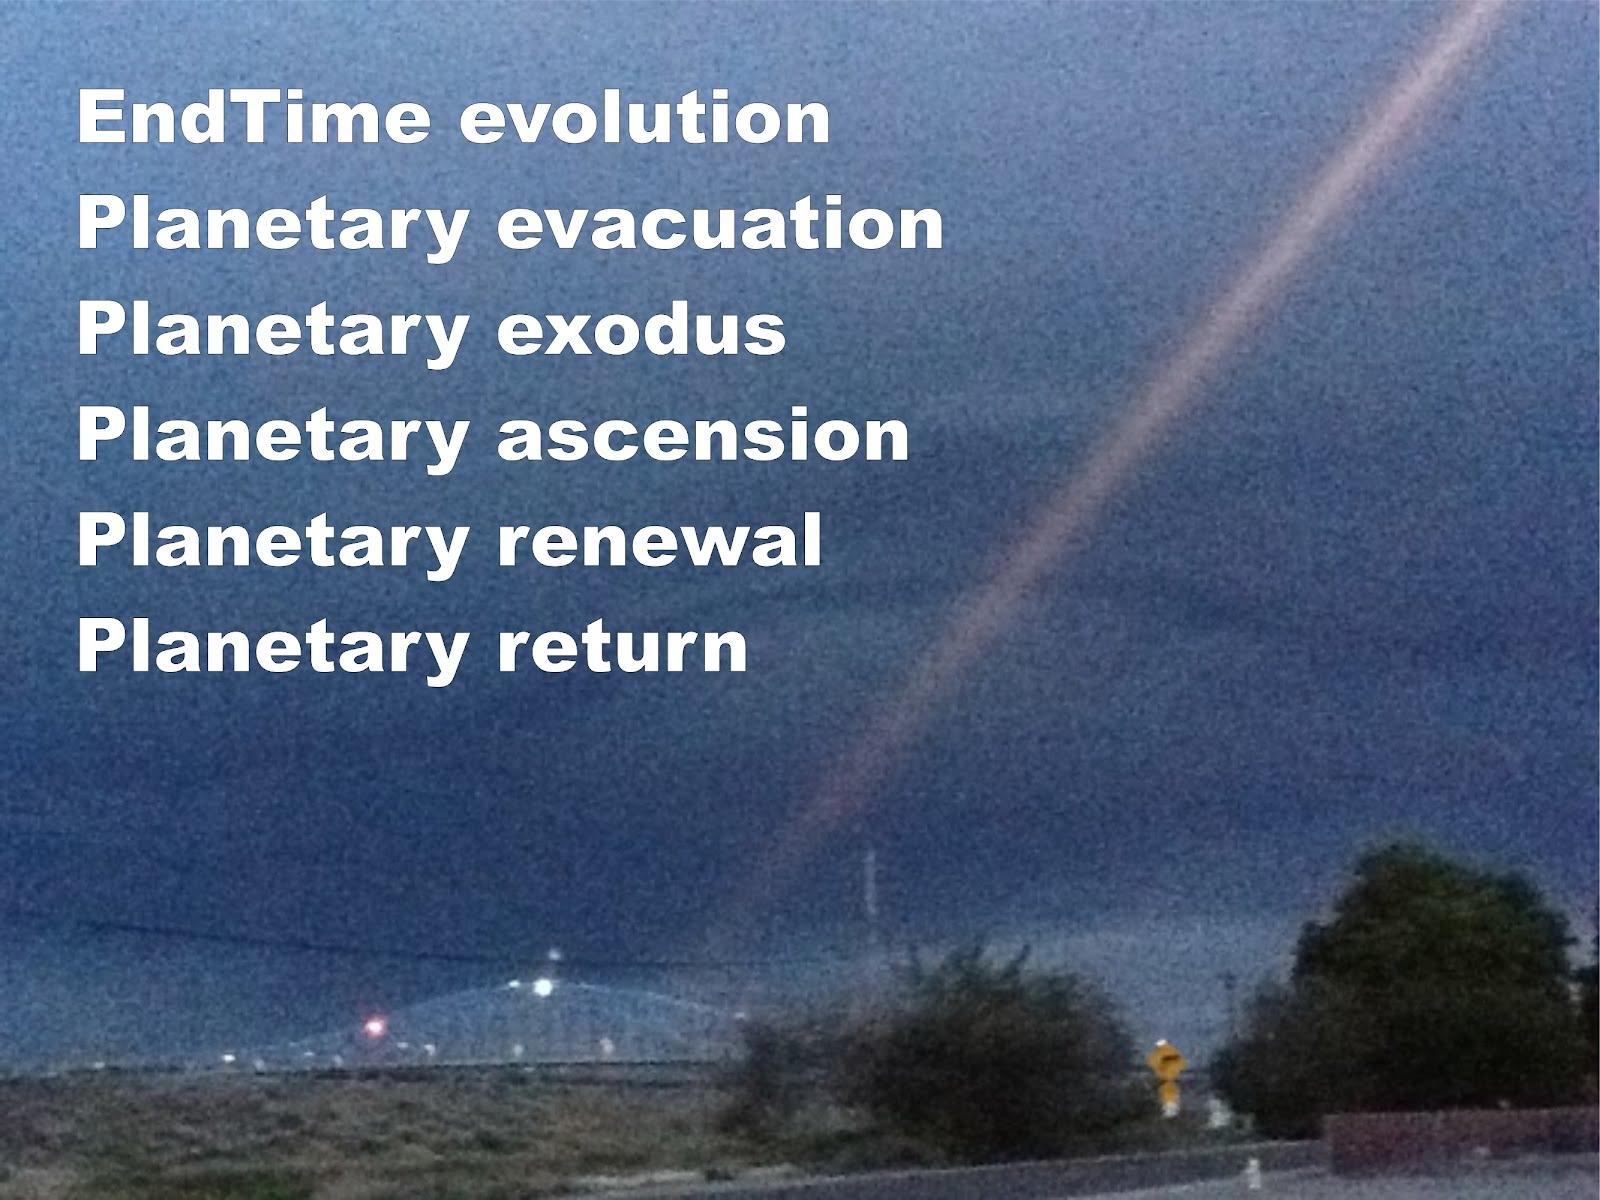 http://www.fourwinds10.net/siterun_data/spiritual/specific_channelings/ashtar/news.php?q=1226601574